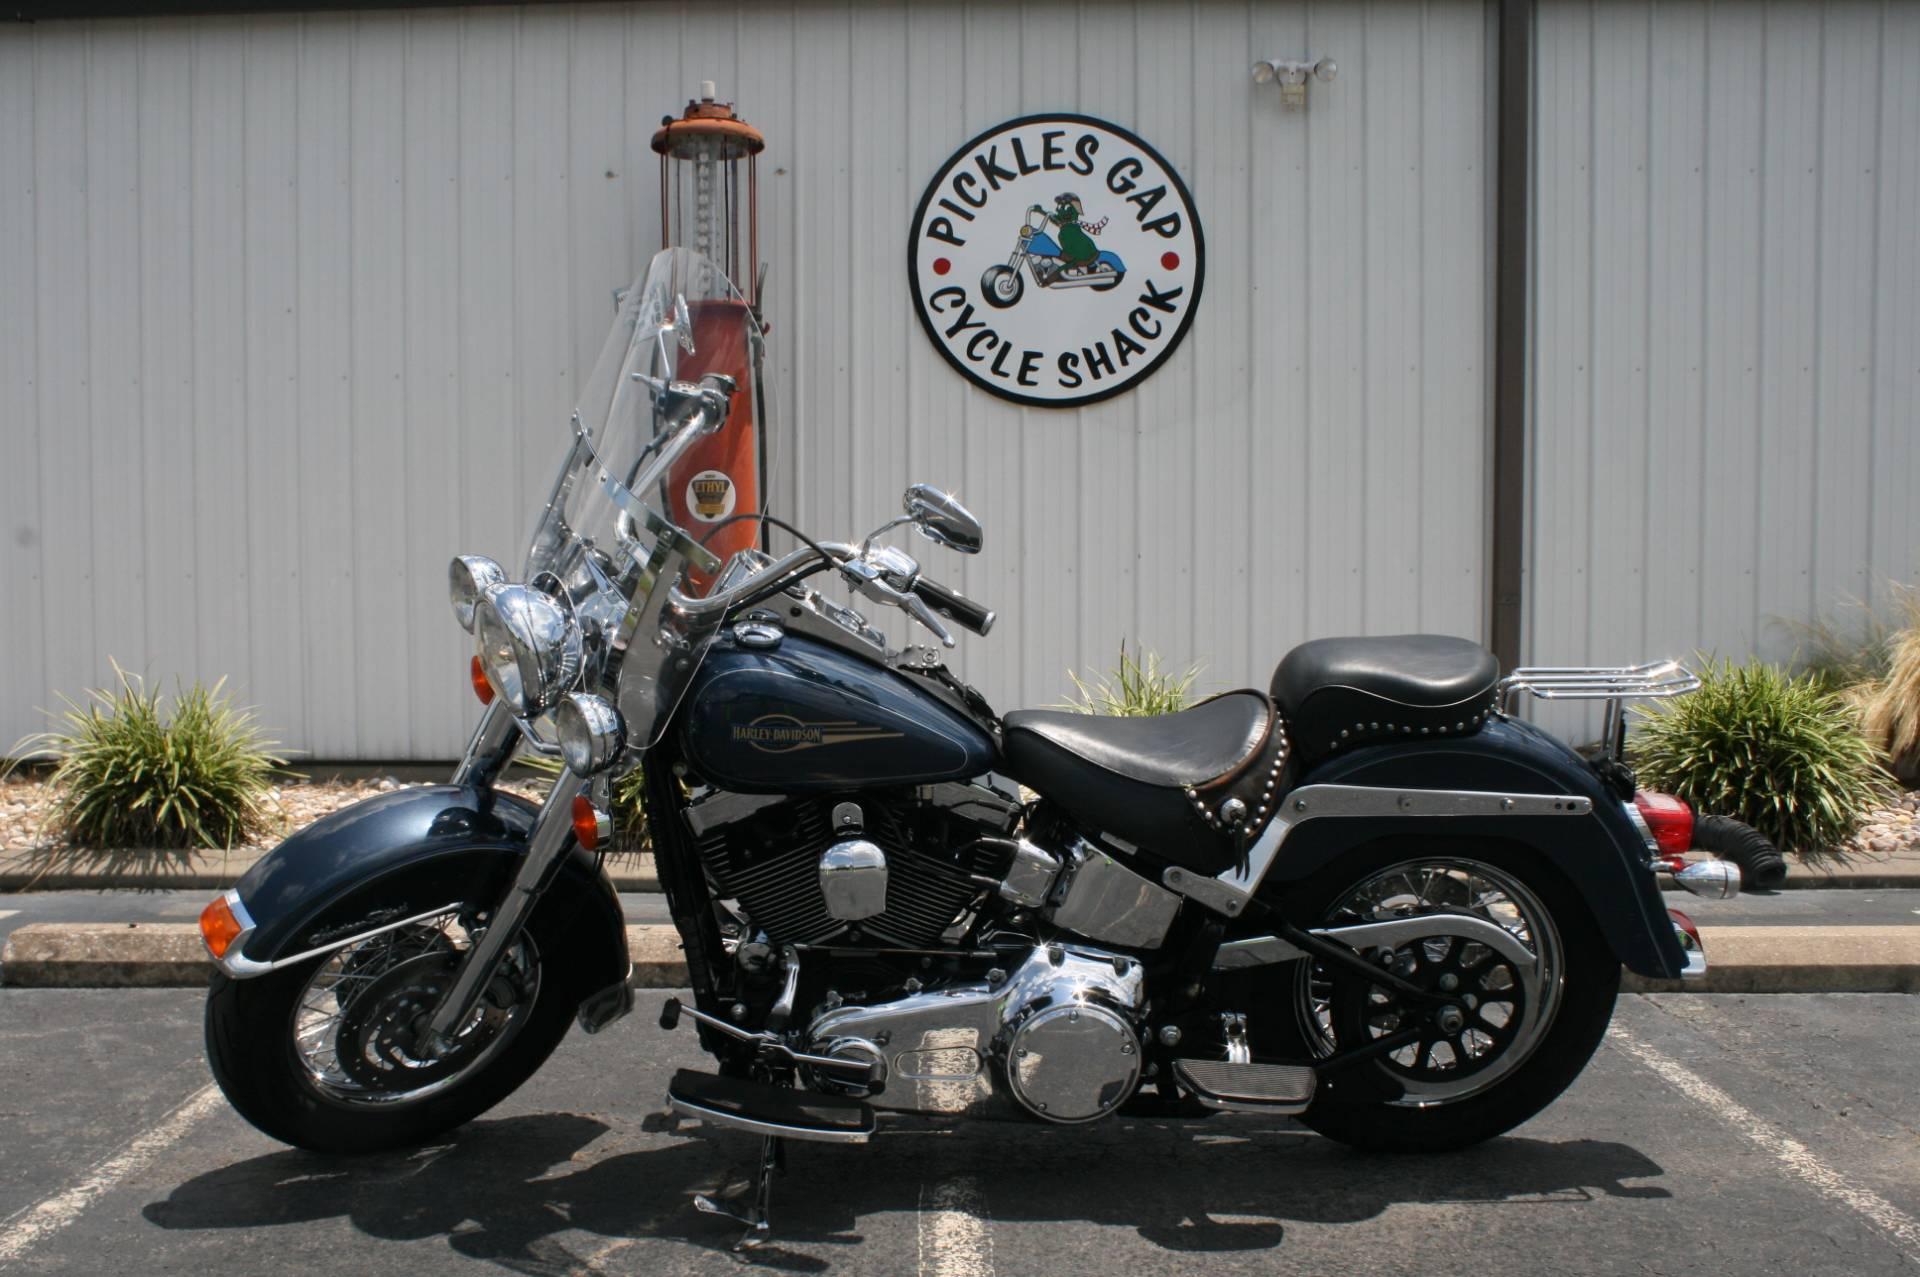 2008 Harley-Davidson FLSTC HERITAGE SOFTAIL in Greenbrier, Arkansas